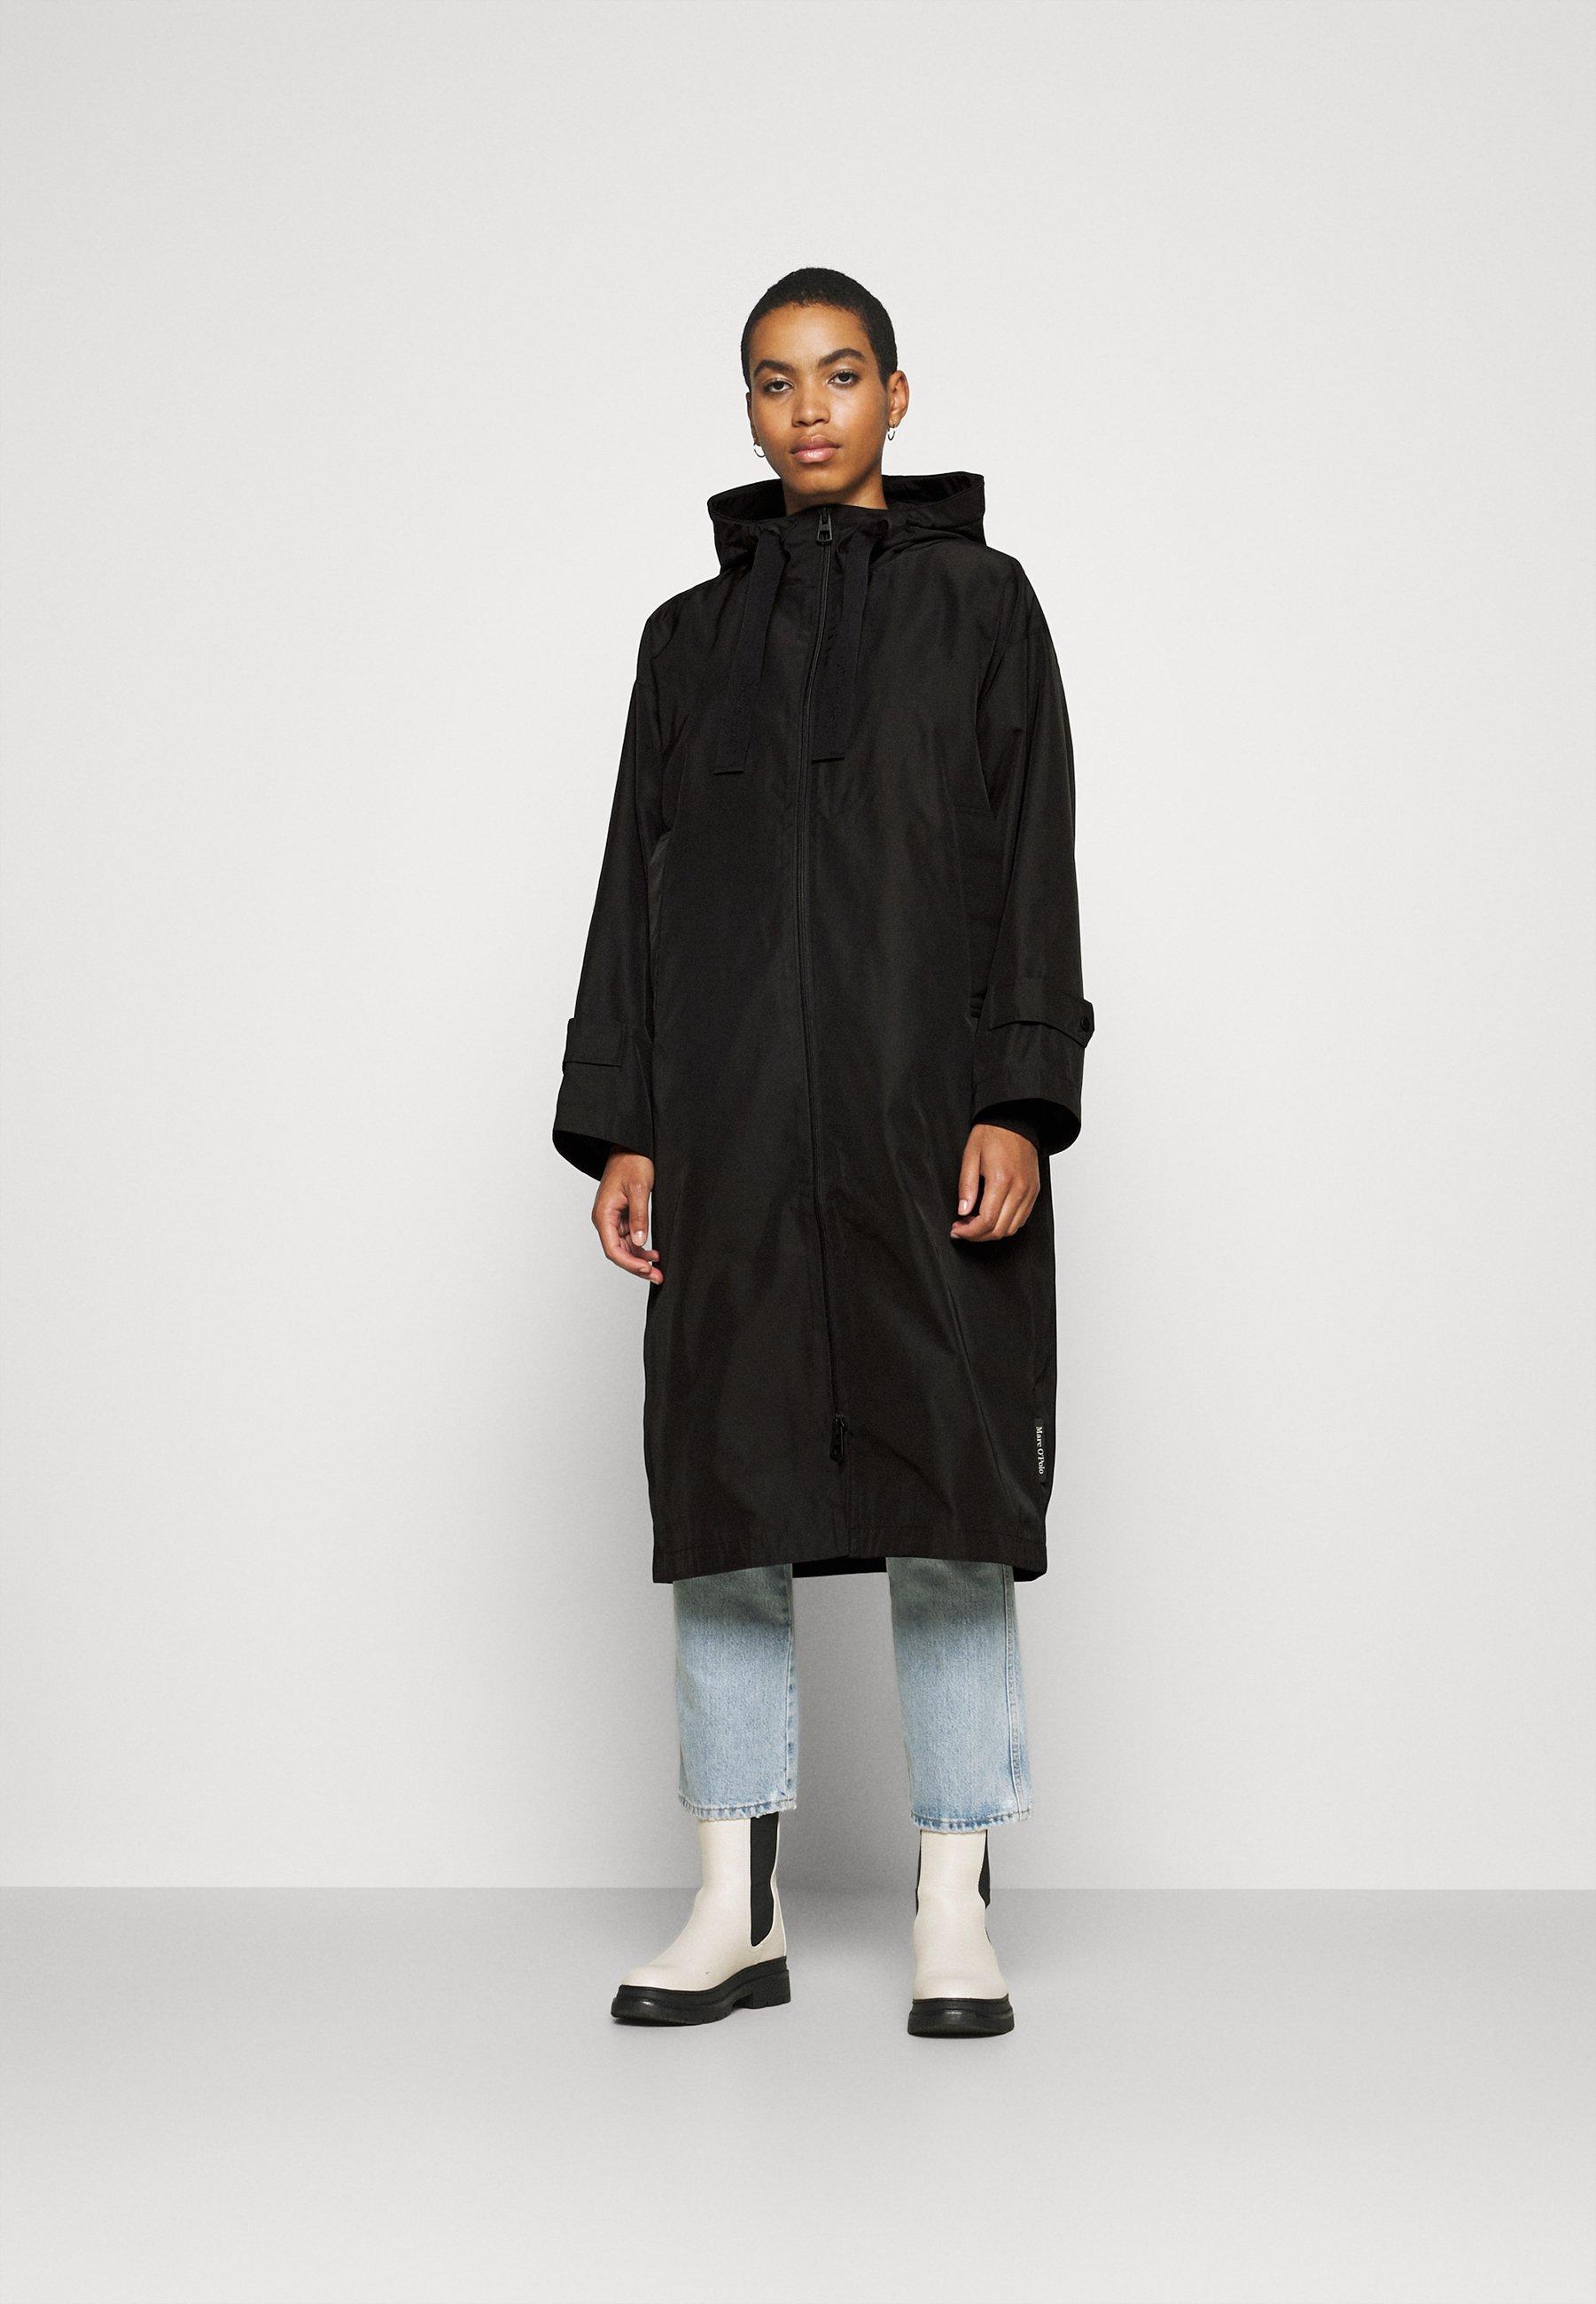 Femme COAT DRAWSTRING WAIST - Veste imperméable